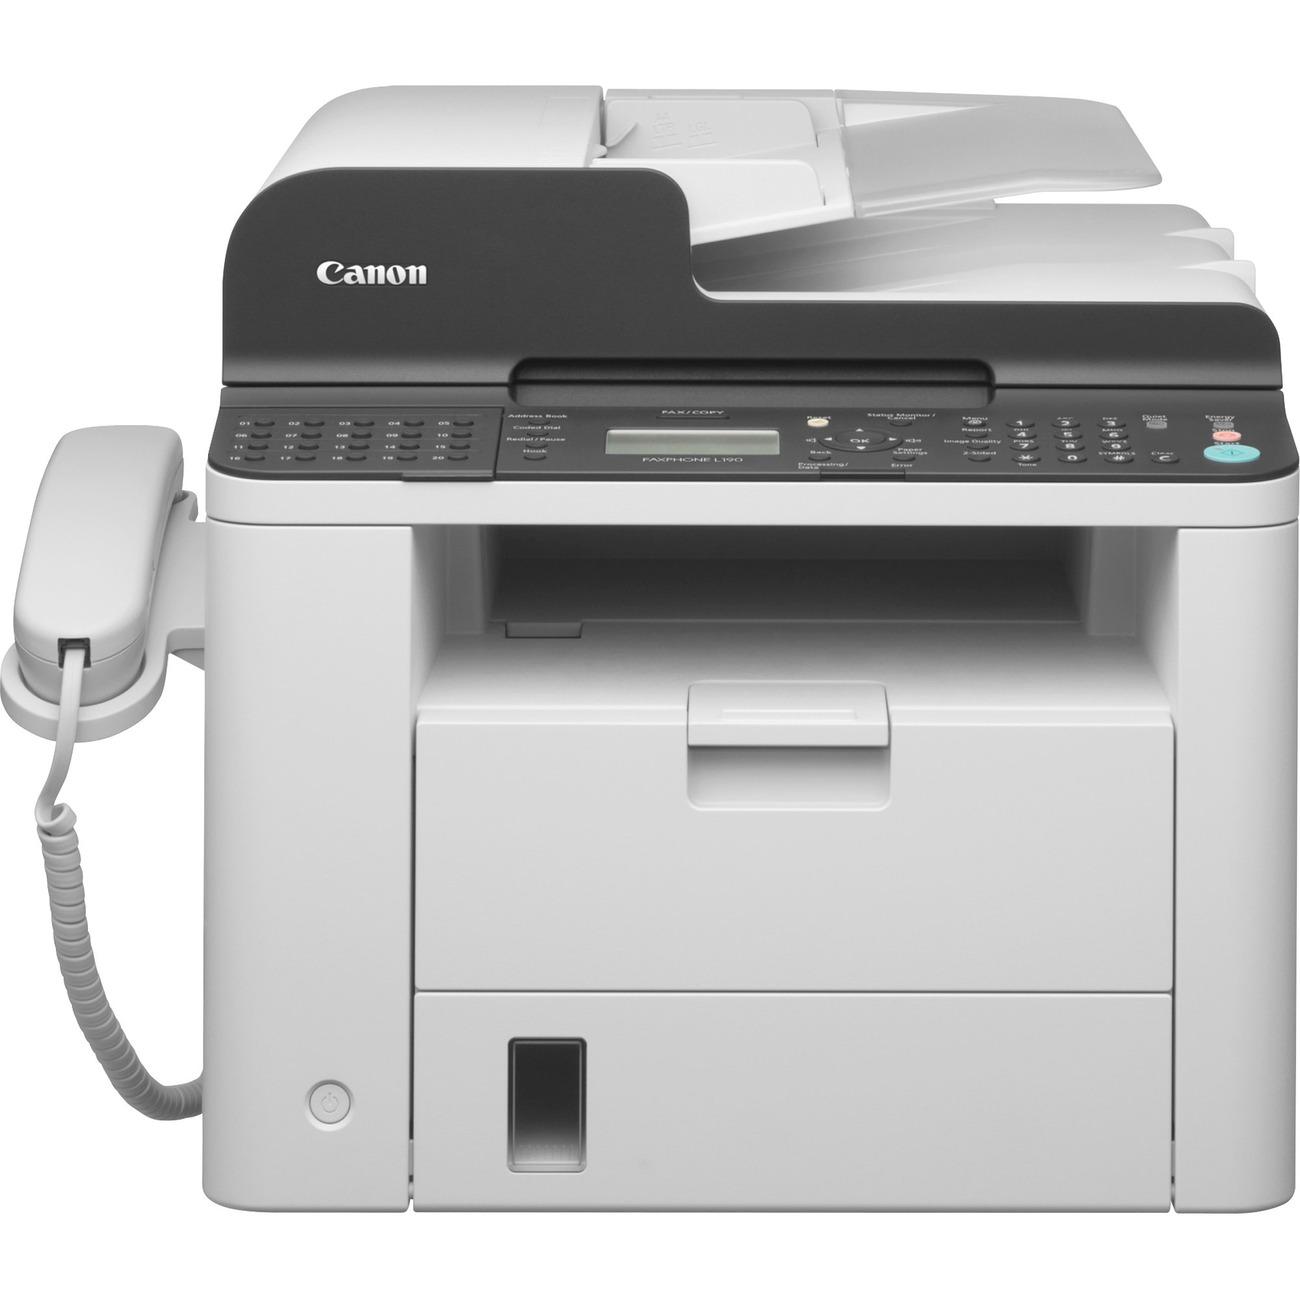 Canon Faxphone l190 Manual